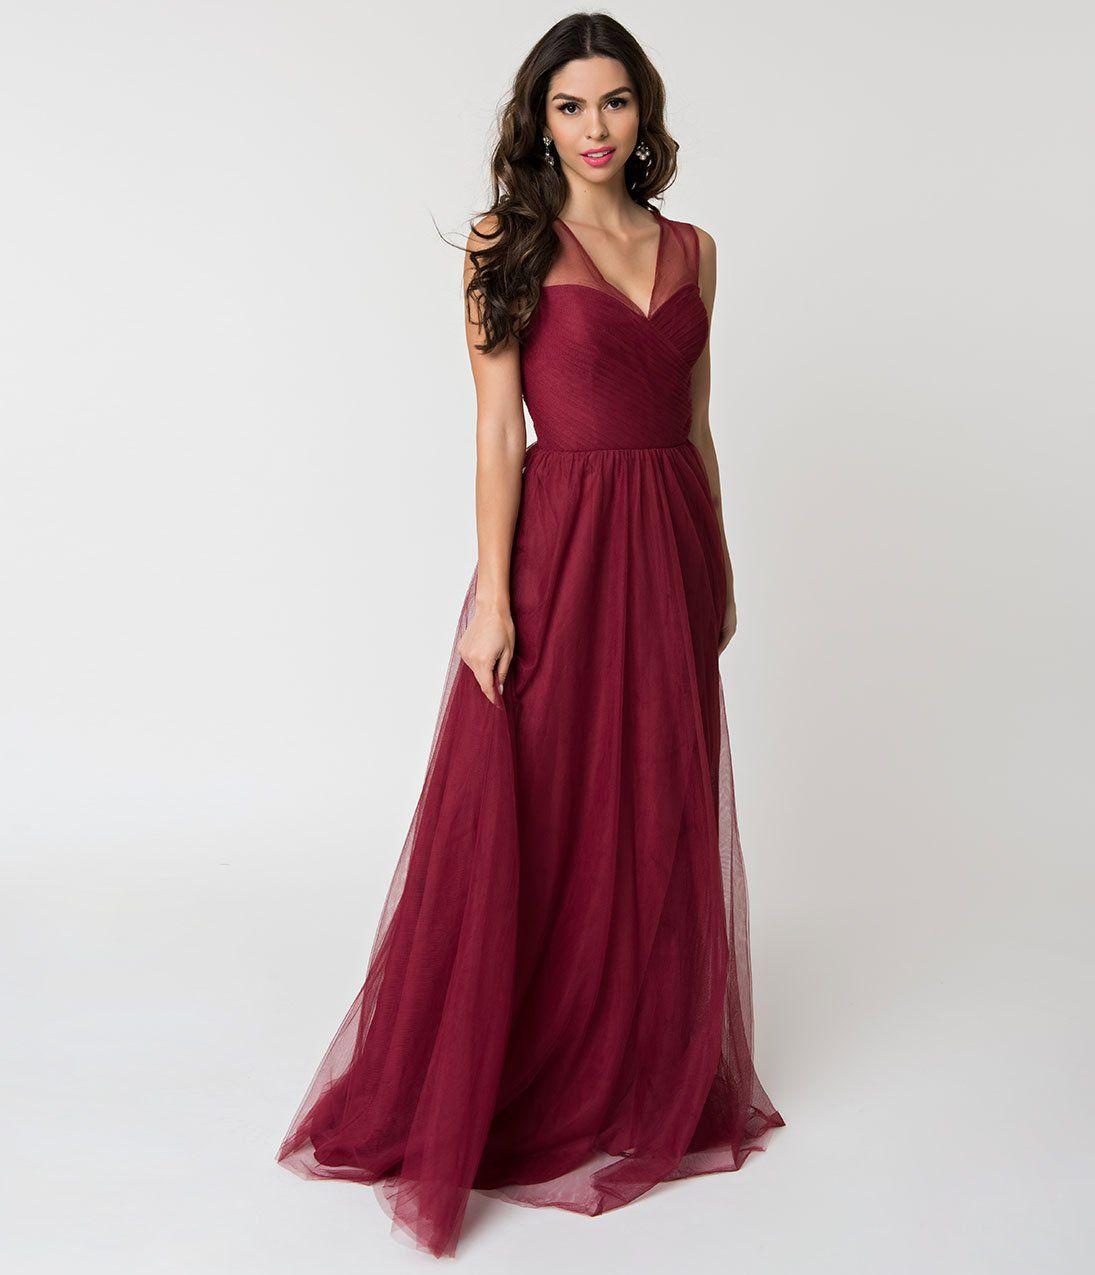 S bridesmaid dresses in wedding vintage dresses